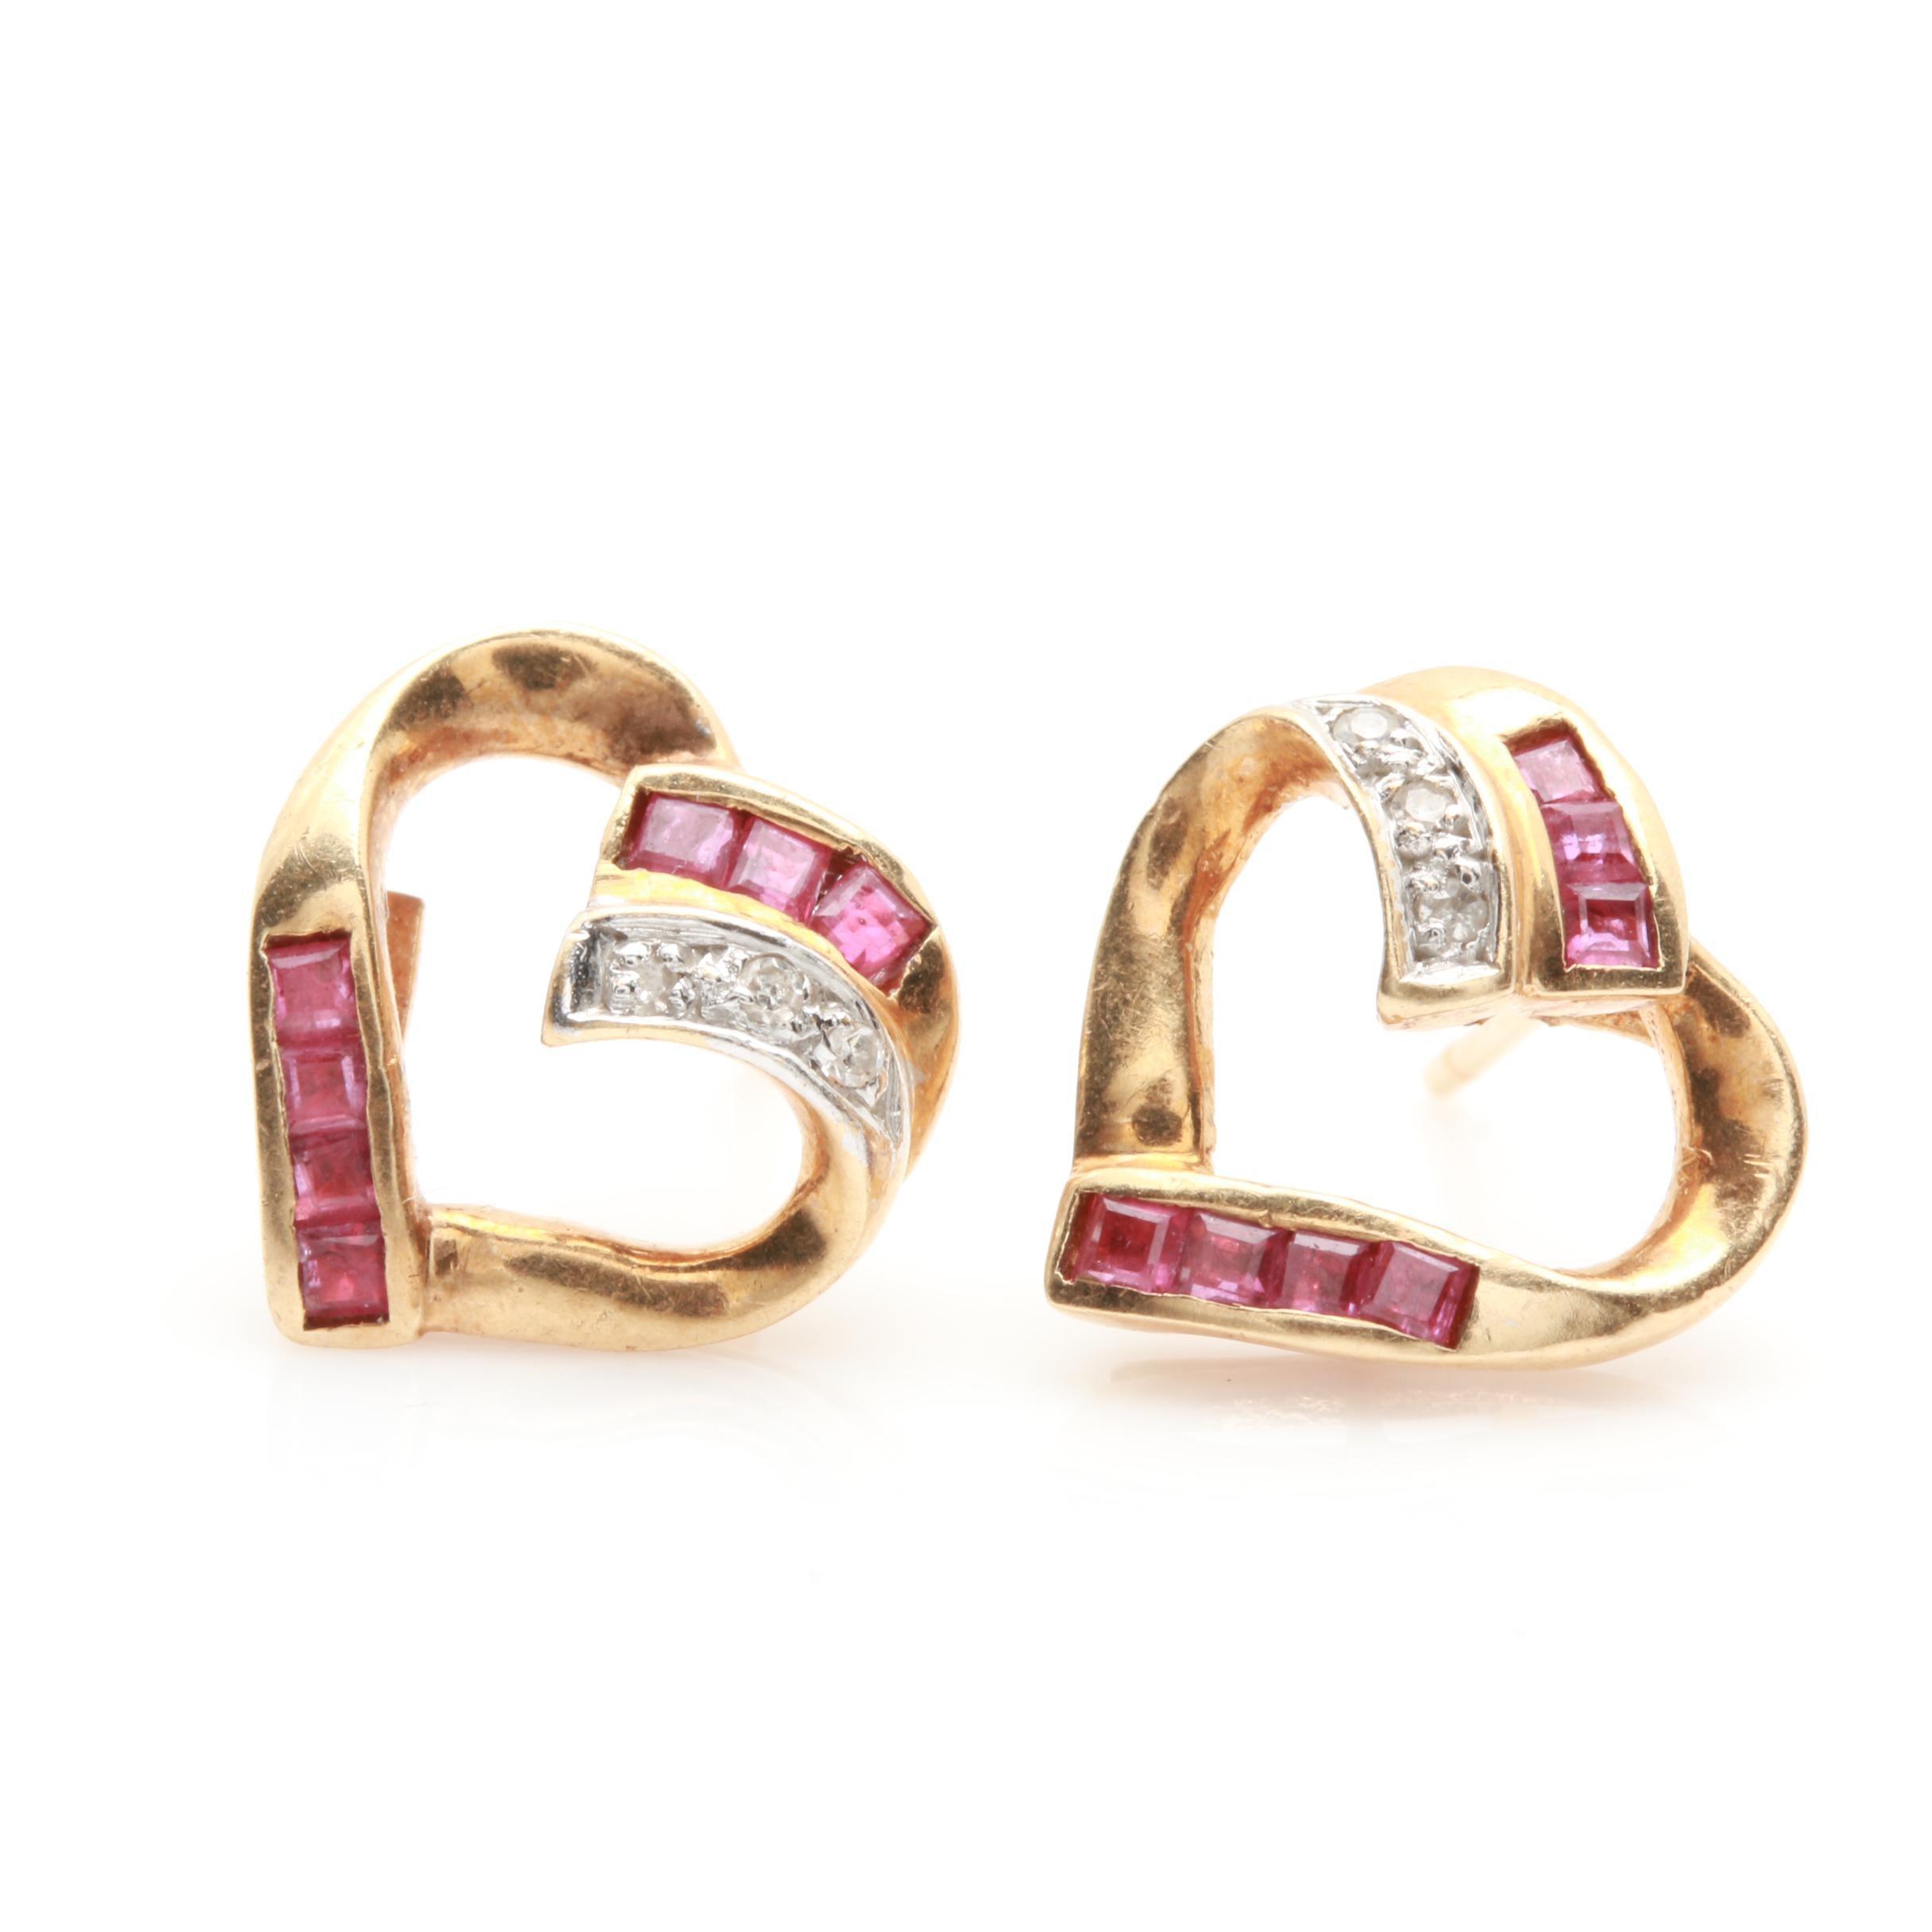 14K Yellow Gold Ruby and Diamond Heart Earrings